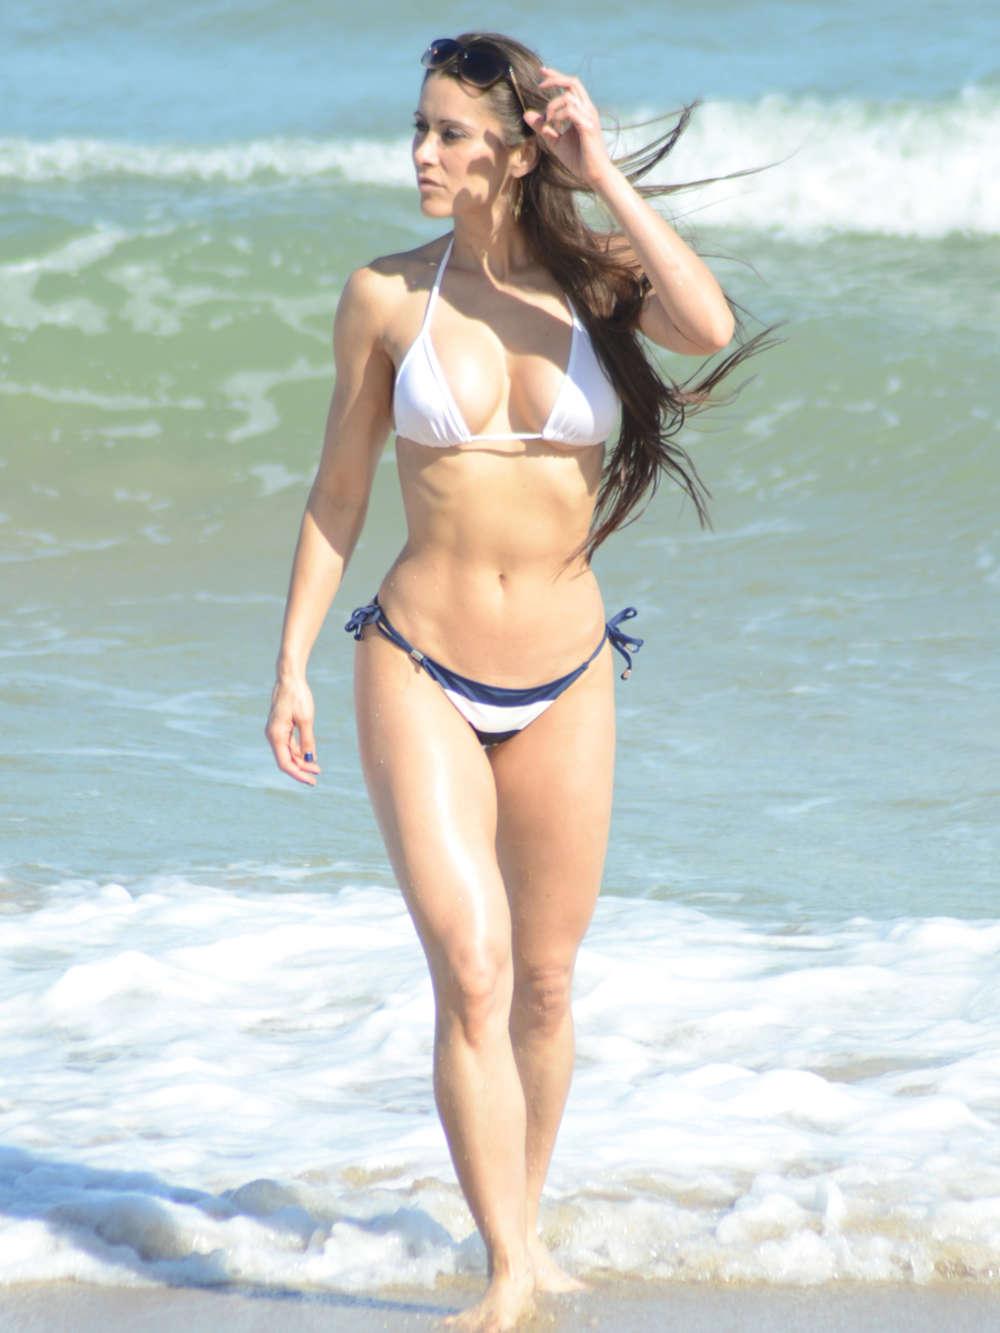 Anais Zanotti Hot anais zanotti hot in bikini -01 | gotceleb